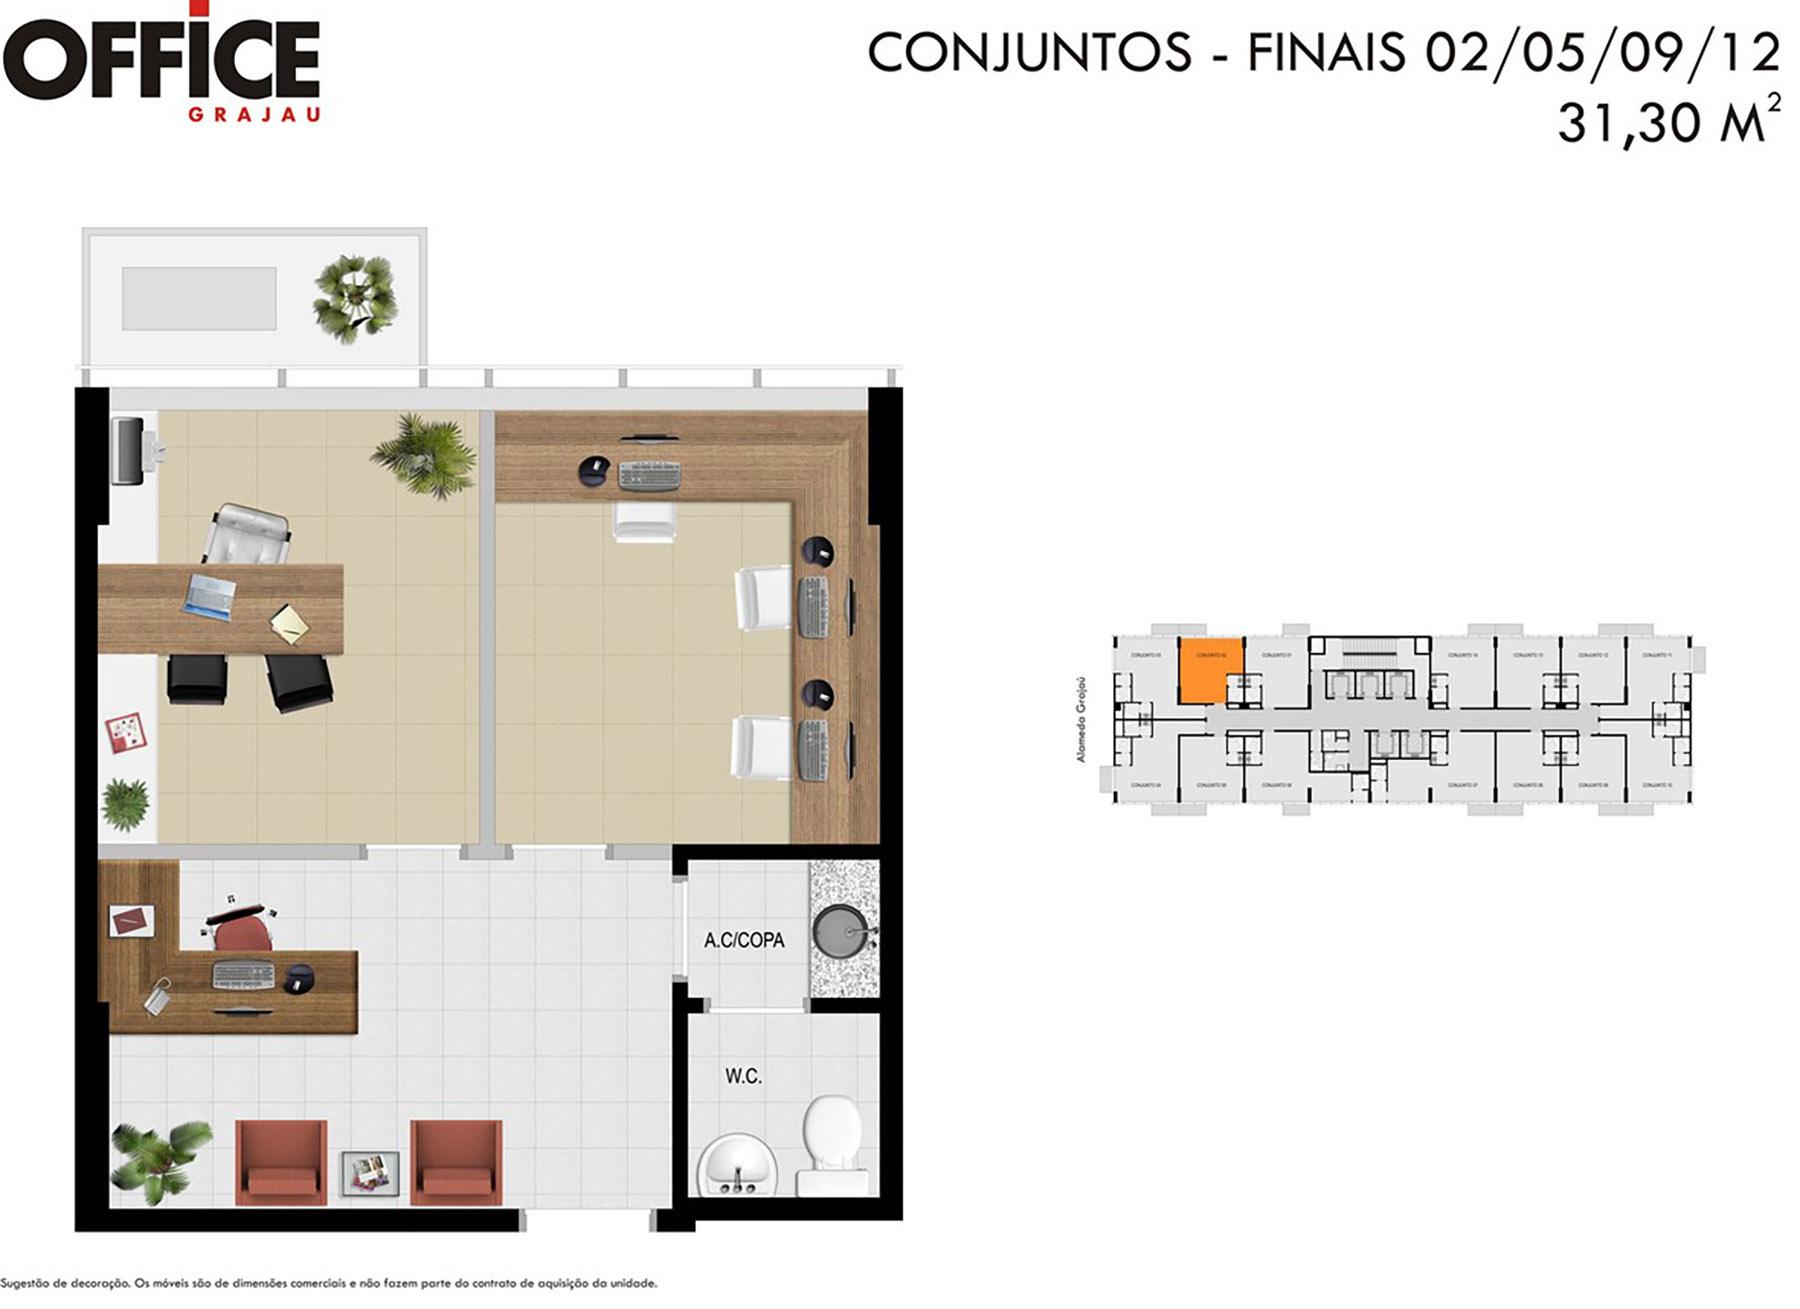 Planta 31m² Office Grajaú